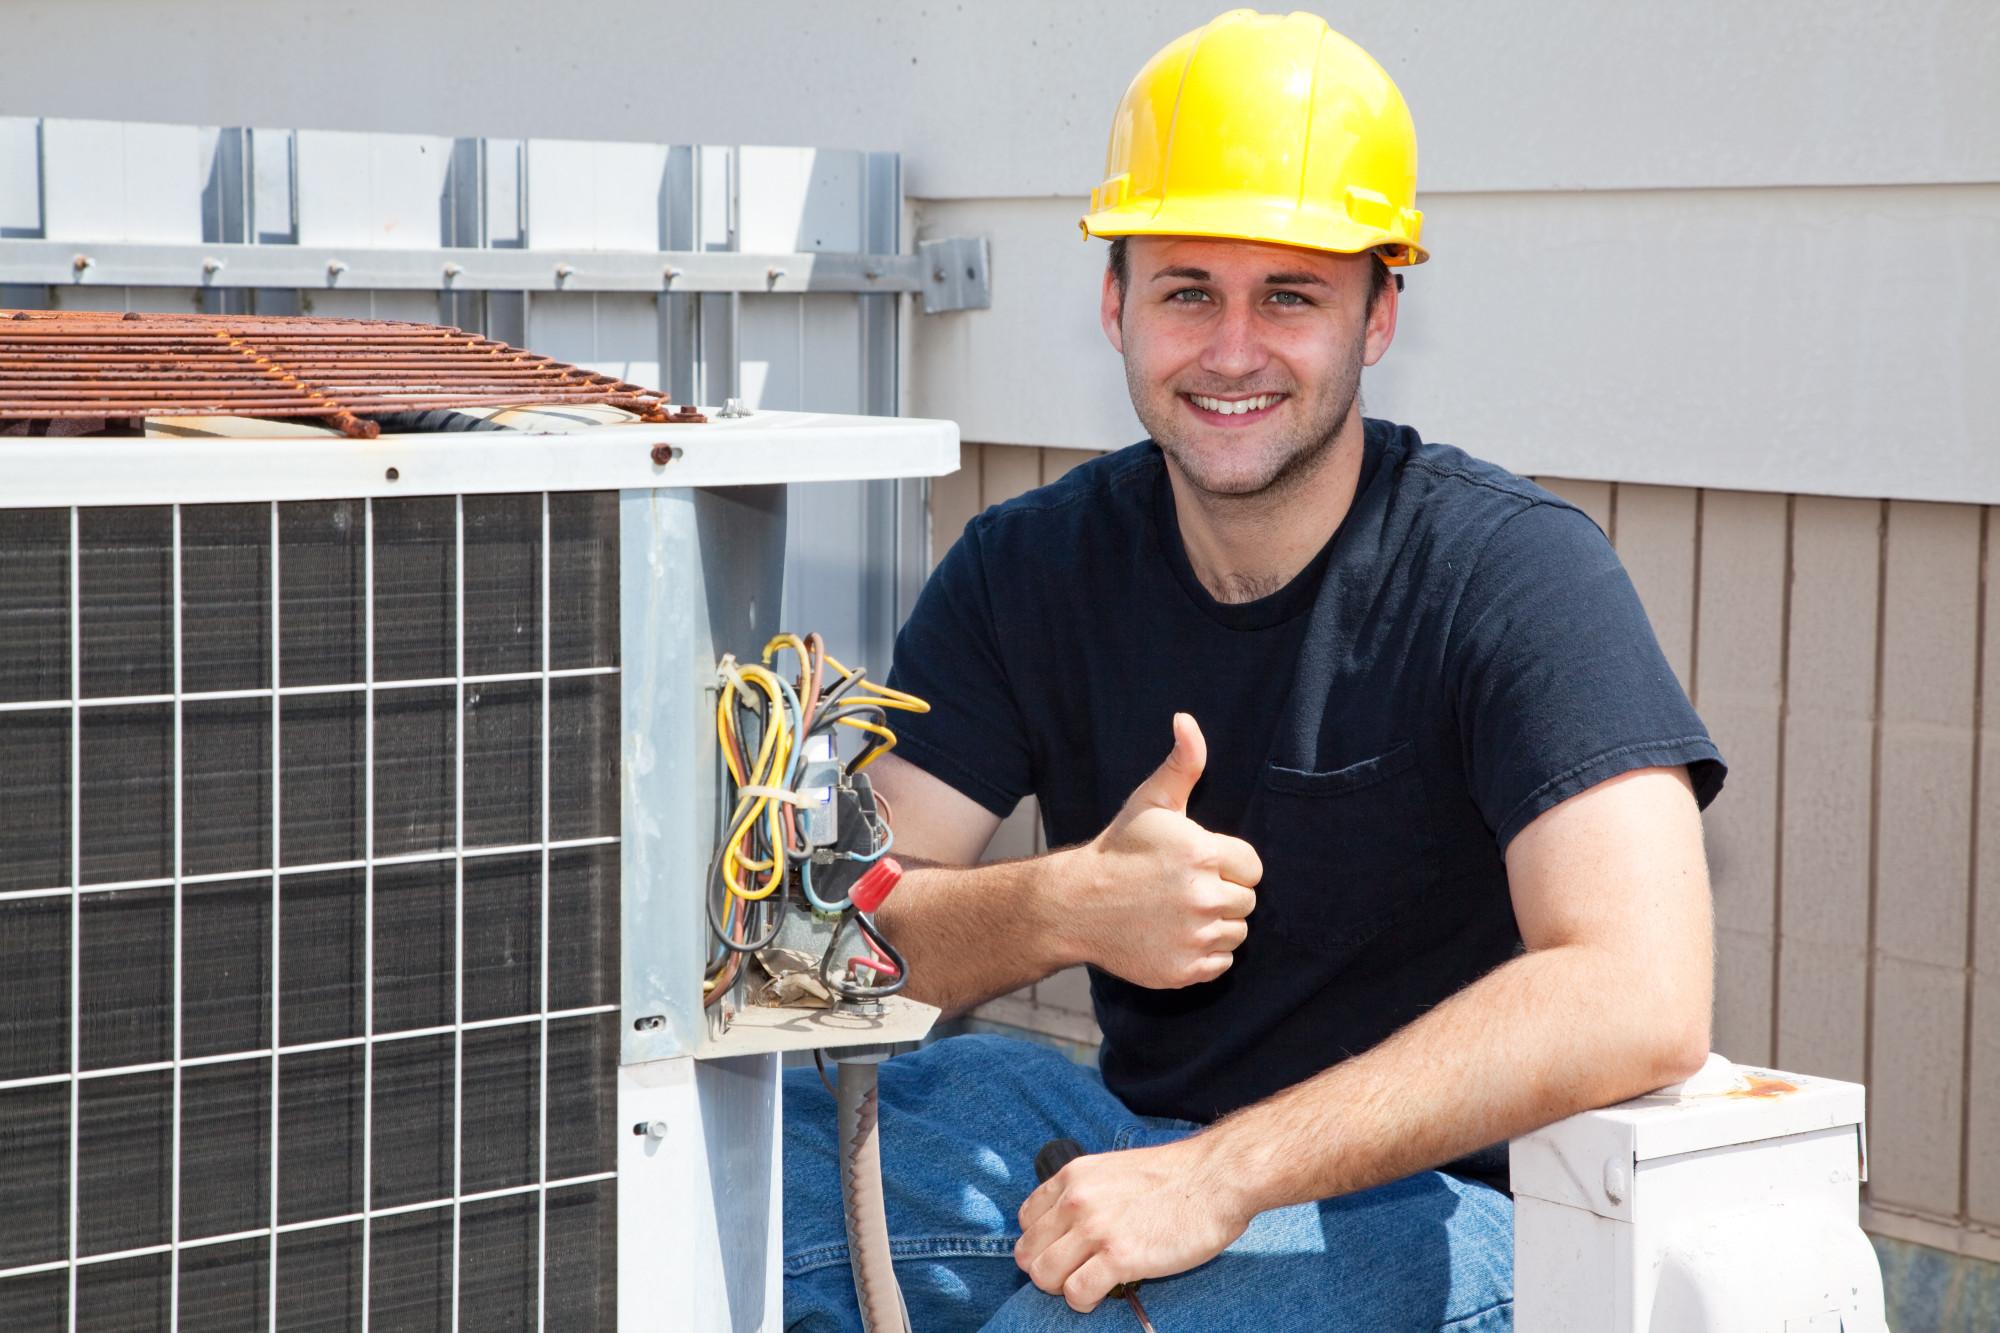 5 AC Unit Maintenance Tips You Should Know About